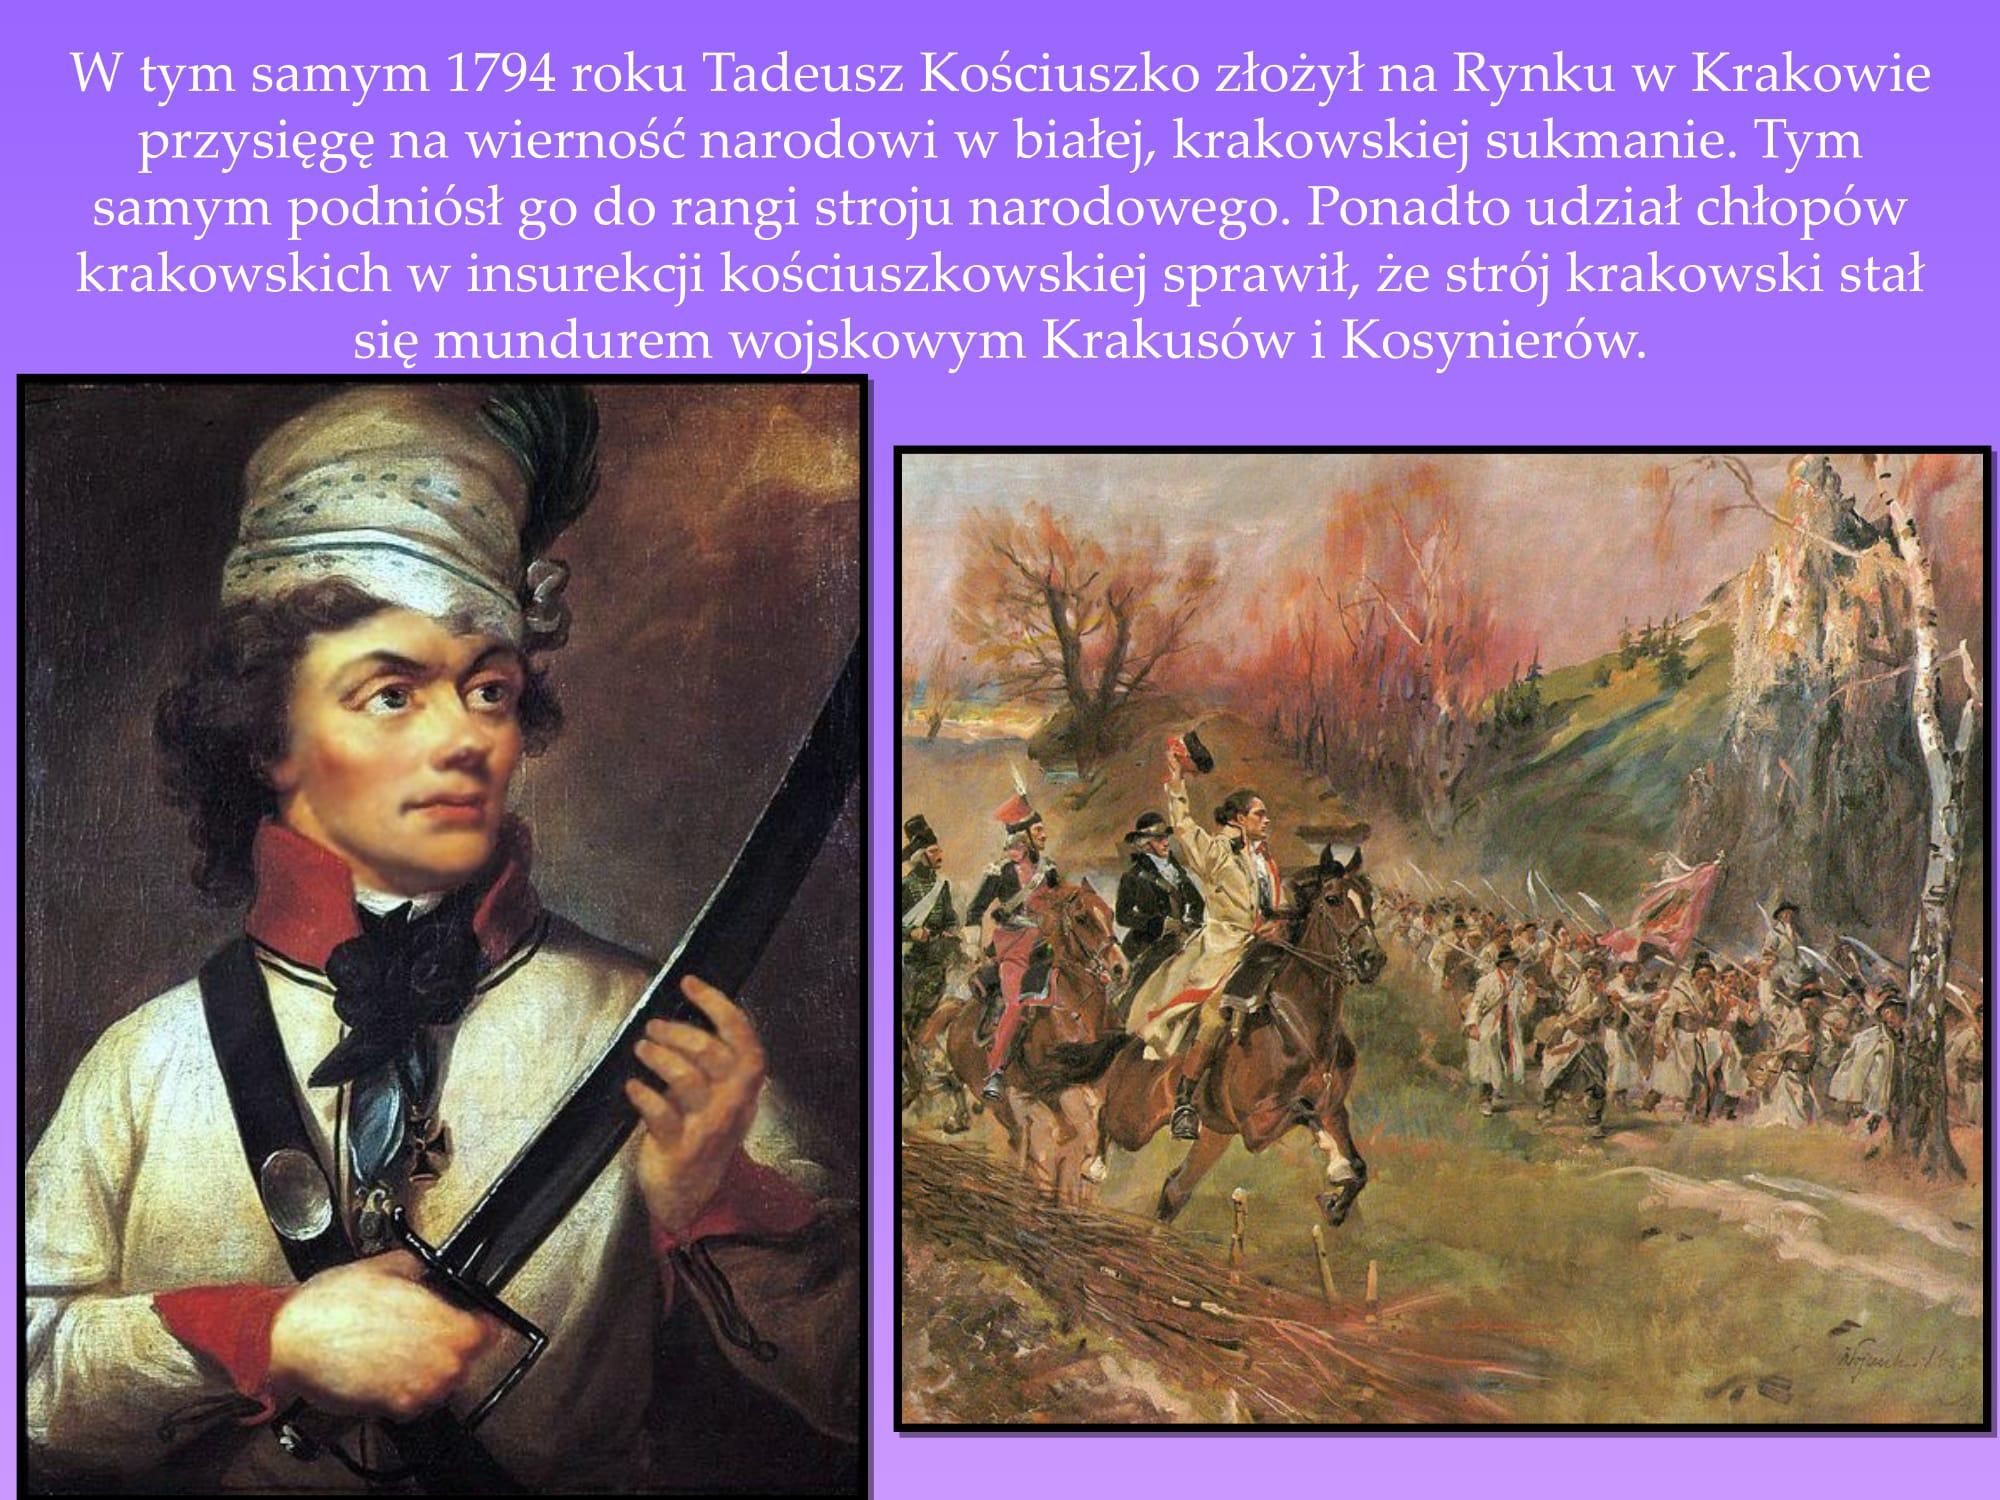 stroj-krakowski-strona-05